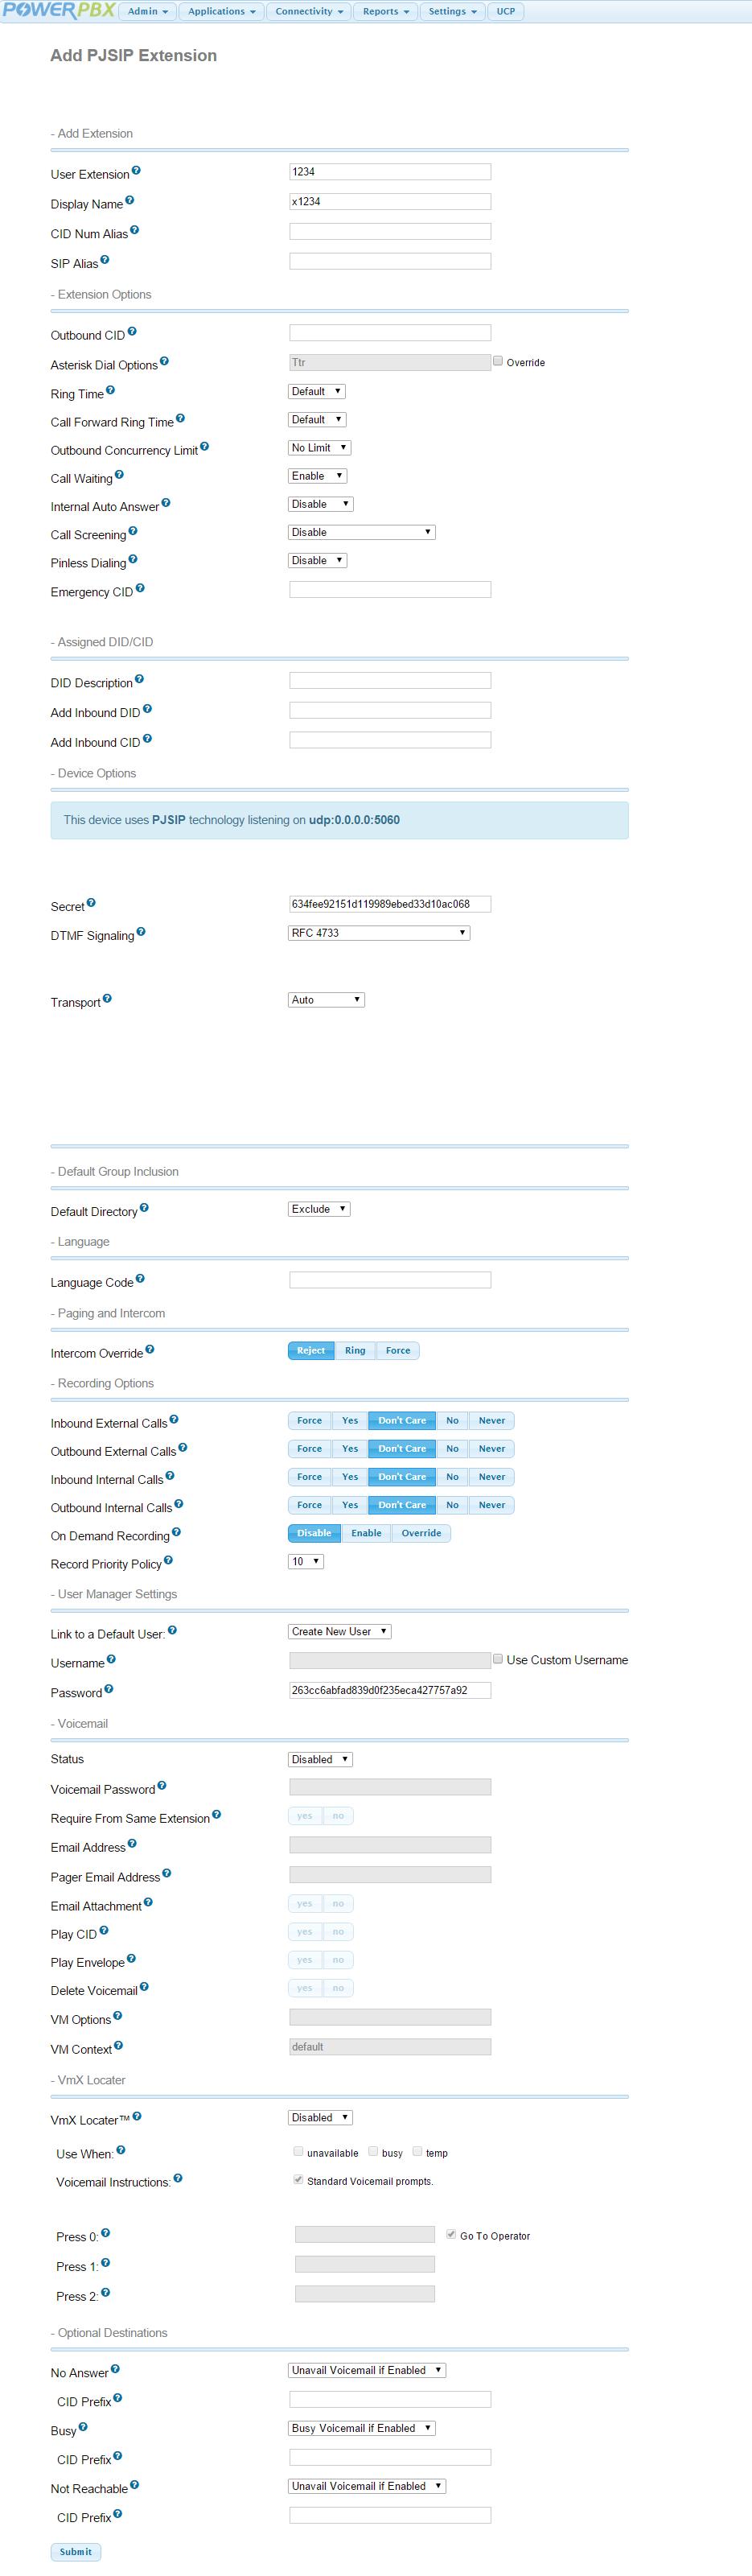 3  PJSIP Extensions — PowerPBX User Guide 12 0 documentation